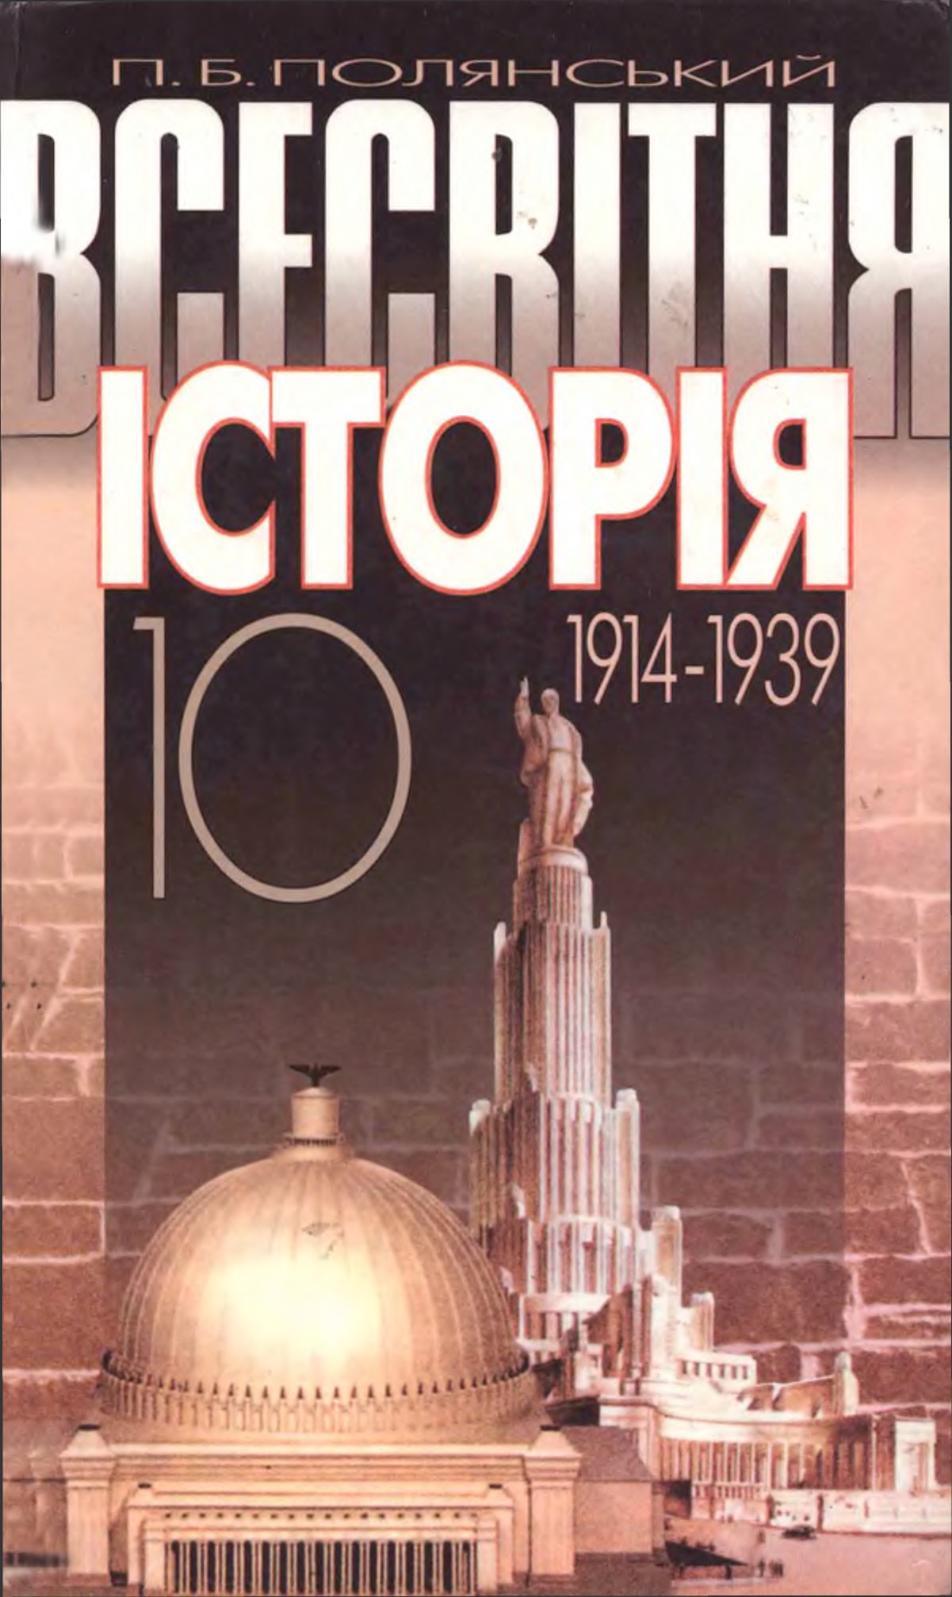 Calaméo - 10 класс. Всемирная история Poljanskij 2003 4a581e74a27a6